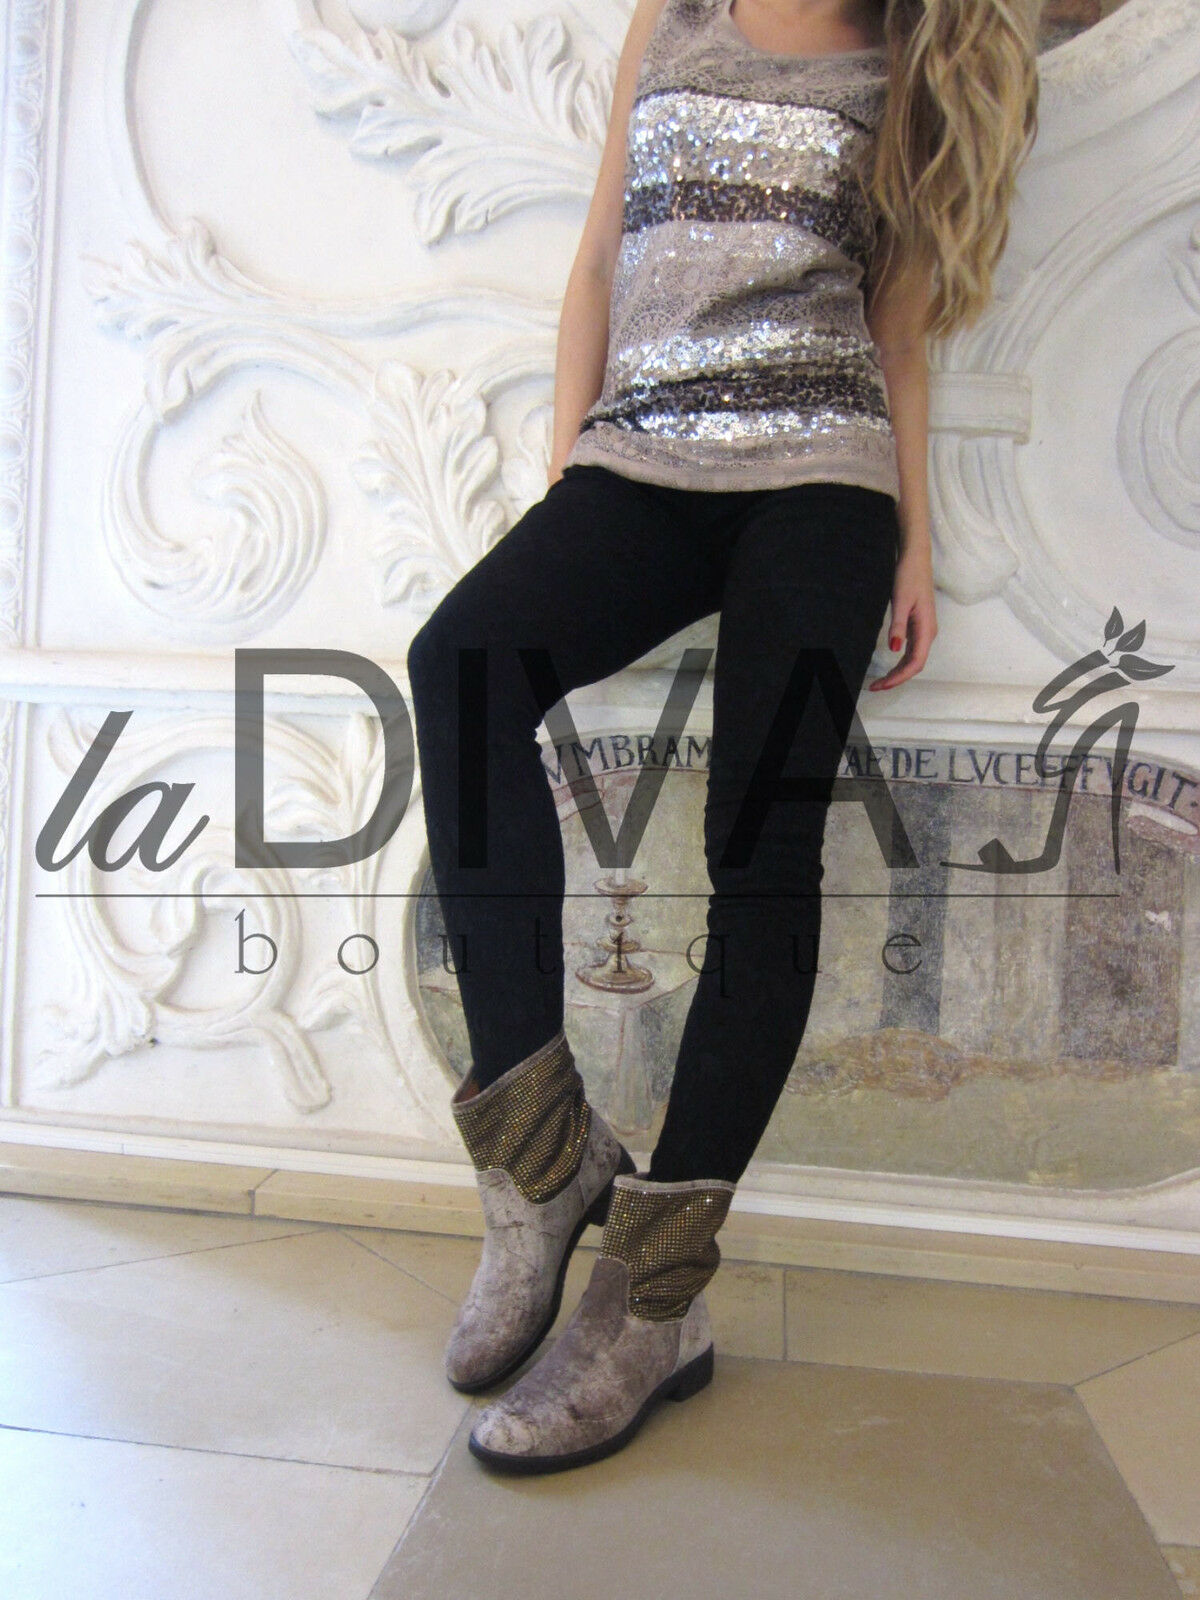 ALBERTO VENTURINI Strass Leder %SALE% Stiefelette Stiefel 35 taupe %SALE% Leder OVP a82642